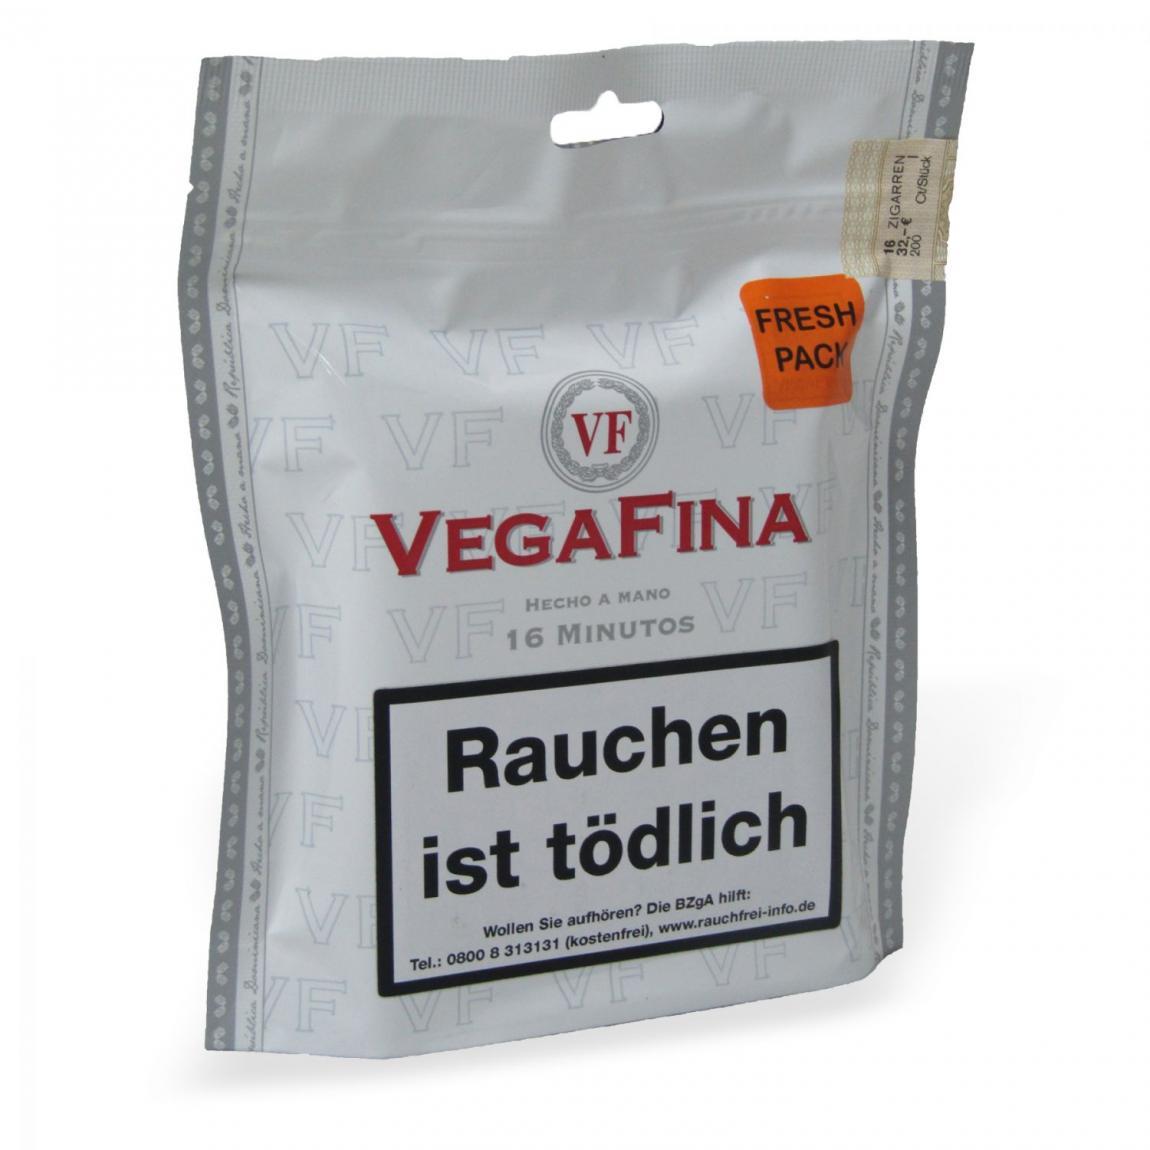 Vega Fina Minutos 16er Fresh-Pack